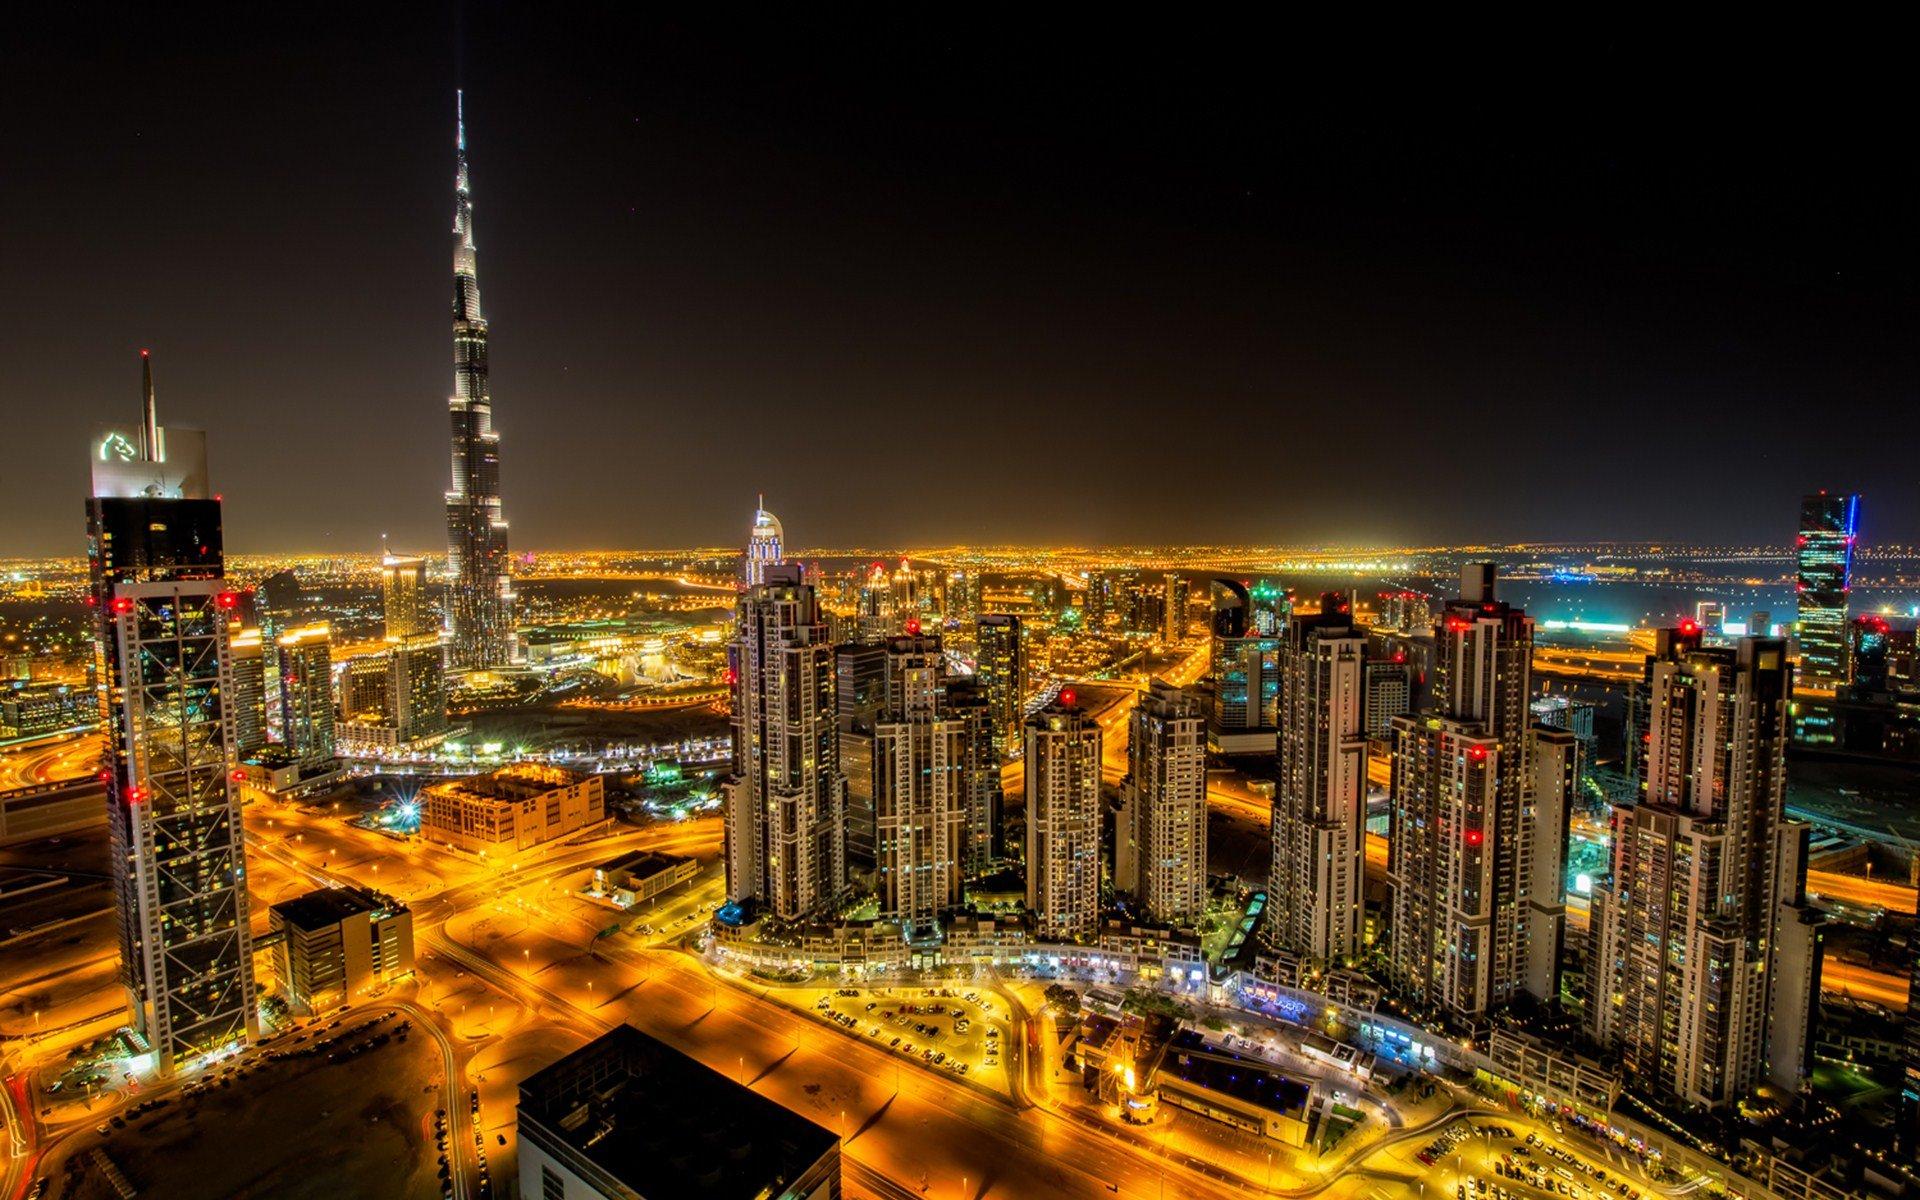 Fantastic Wallpaper Night Dubai - Dubai-Night-Wallpaper-1920x1200  Graphic-38620.jpg